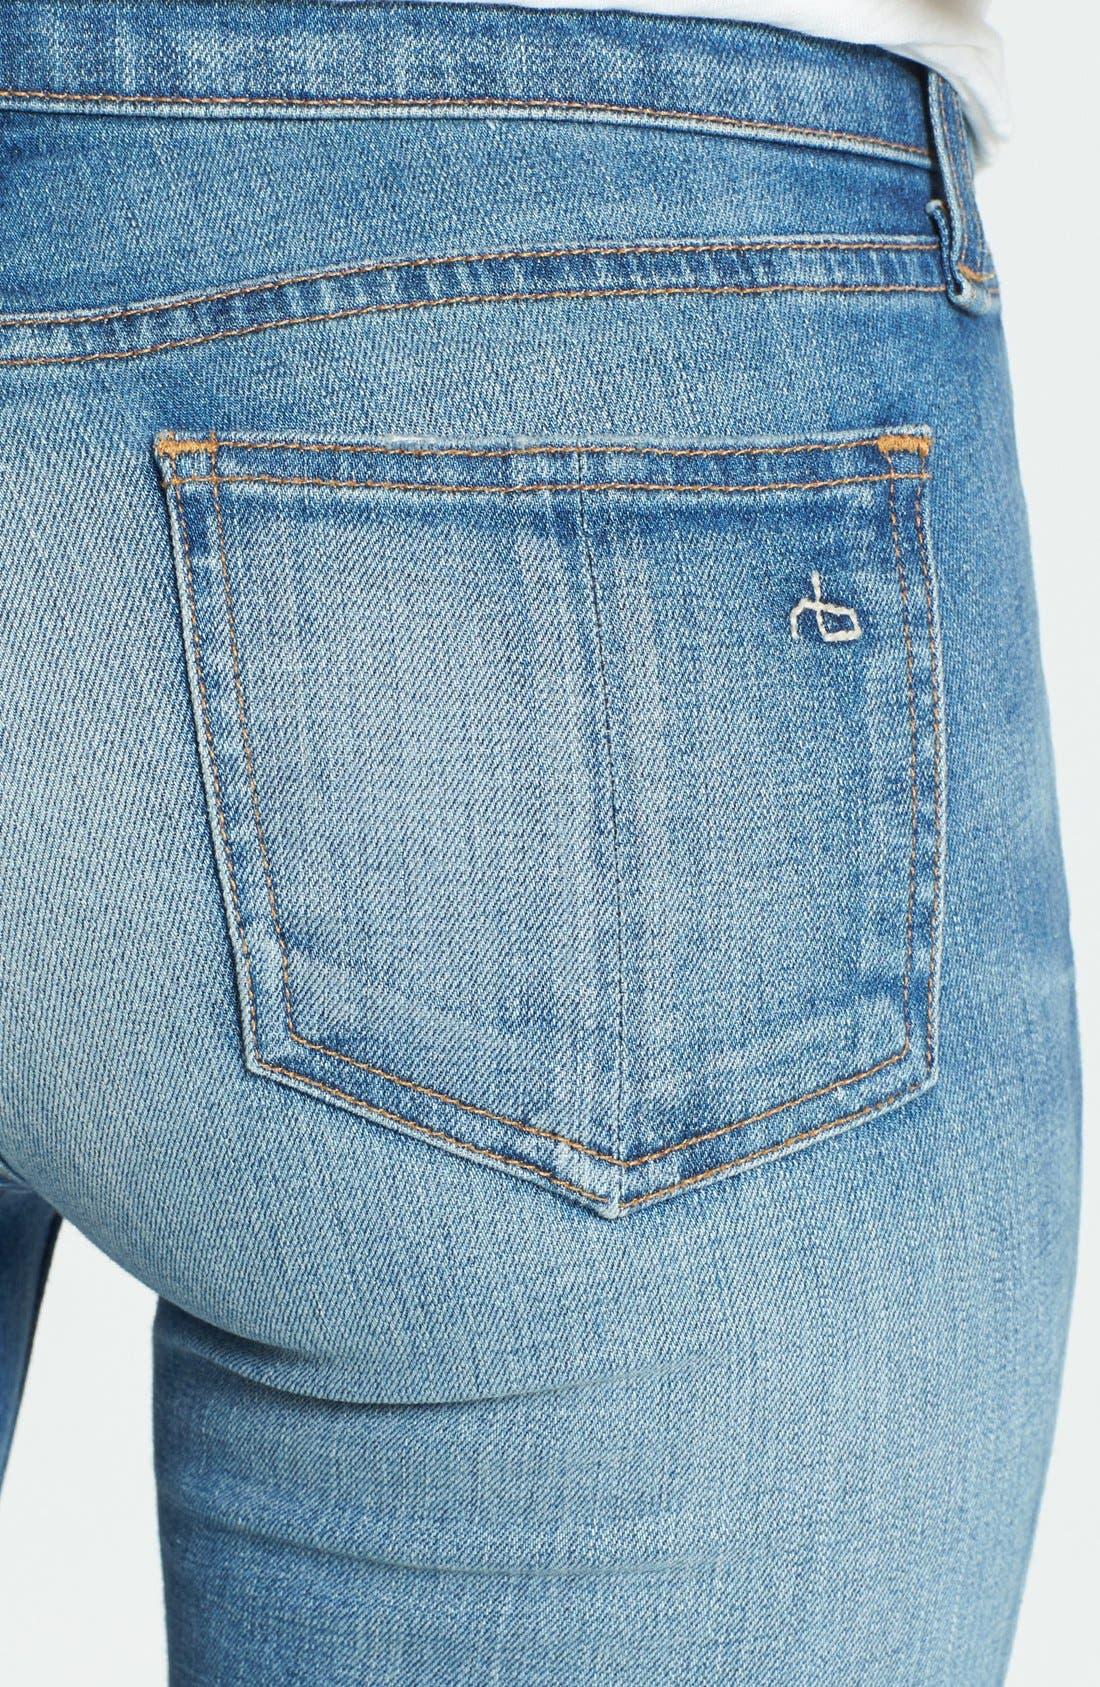 Alternate Image 3  - rag & bone/JEAN Destroyed Skinny Ankle Jeans (Shredded)